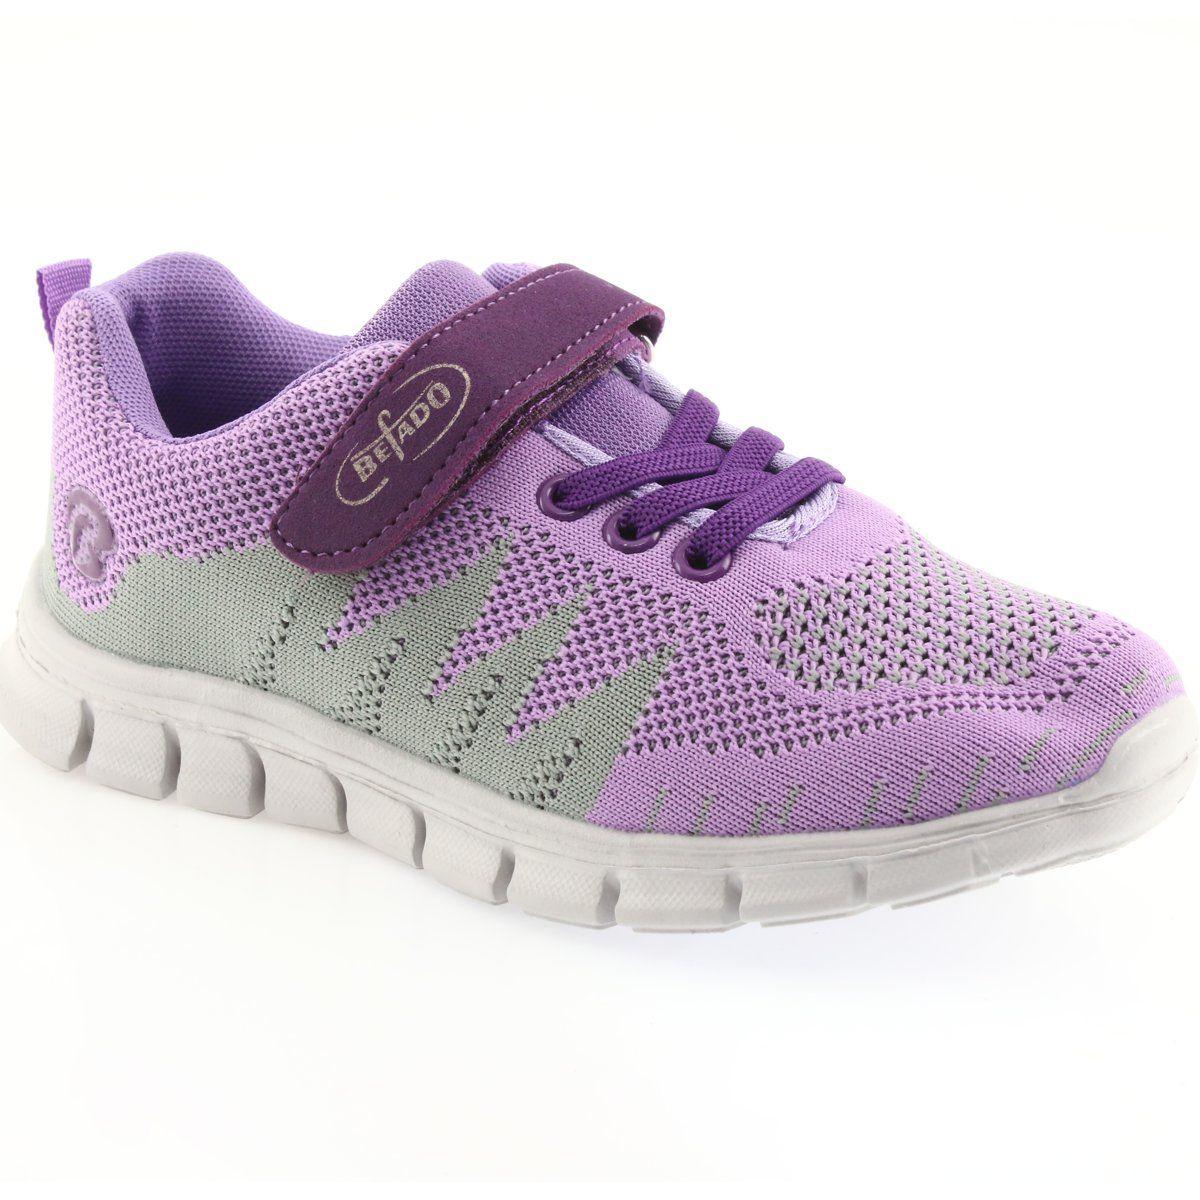 Befado Obuwie Dzieciece Do 23 Cm 516y025 Fioletowe Childrens Shoes Shoes Kid Shoes